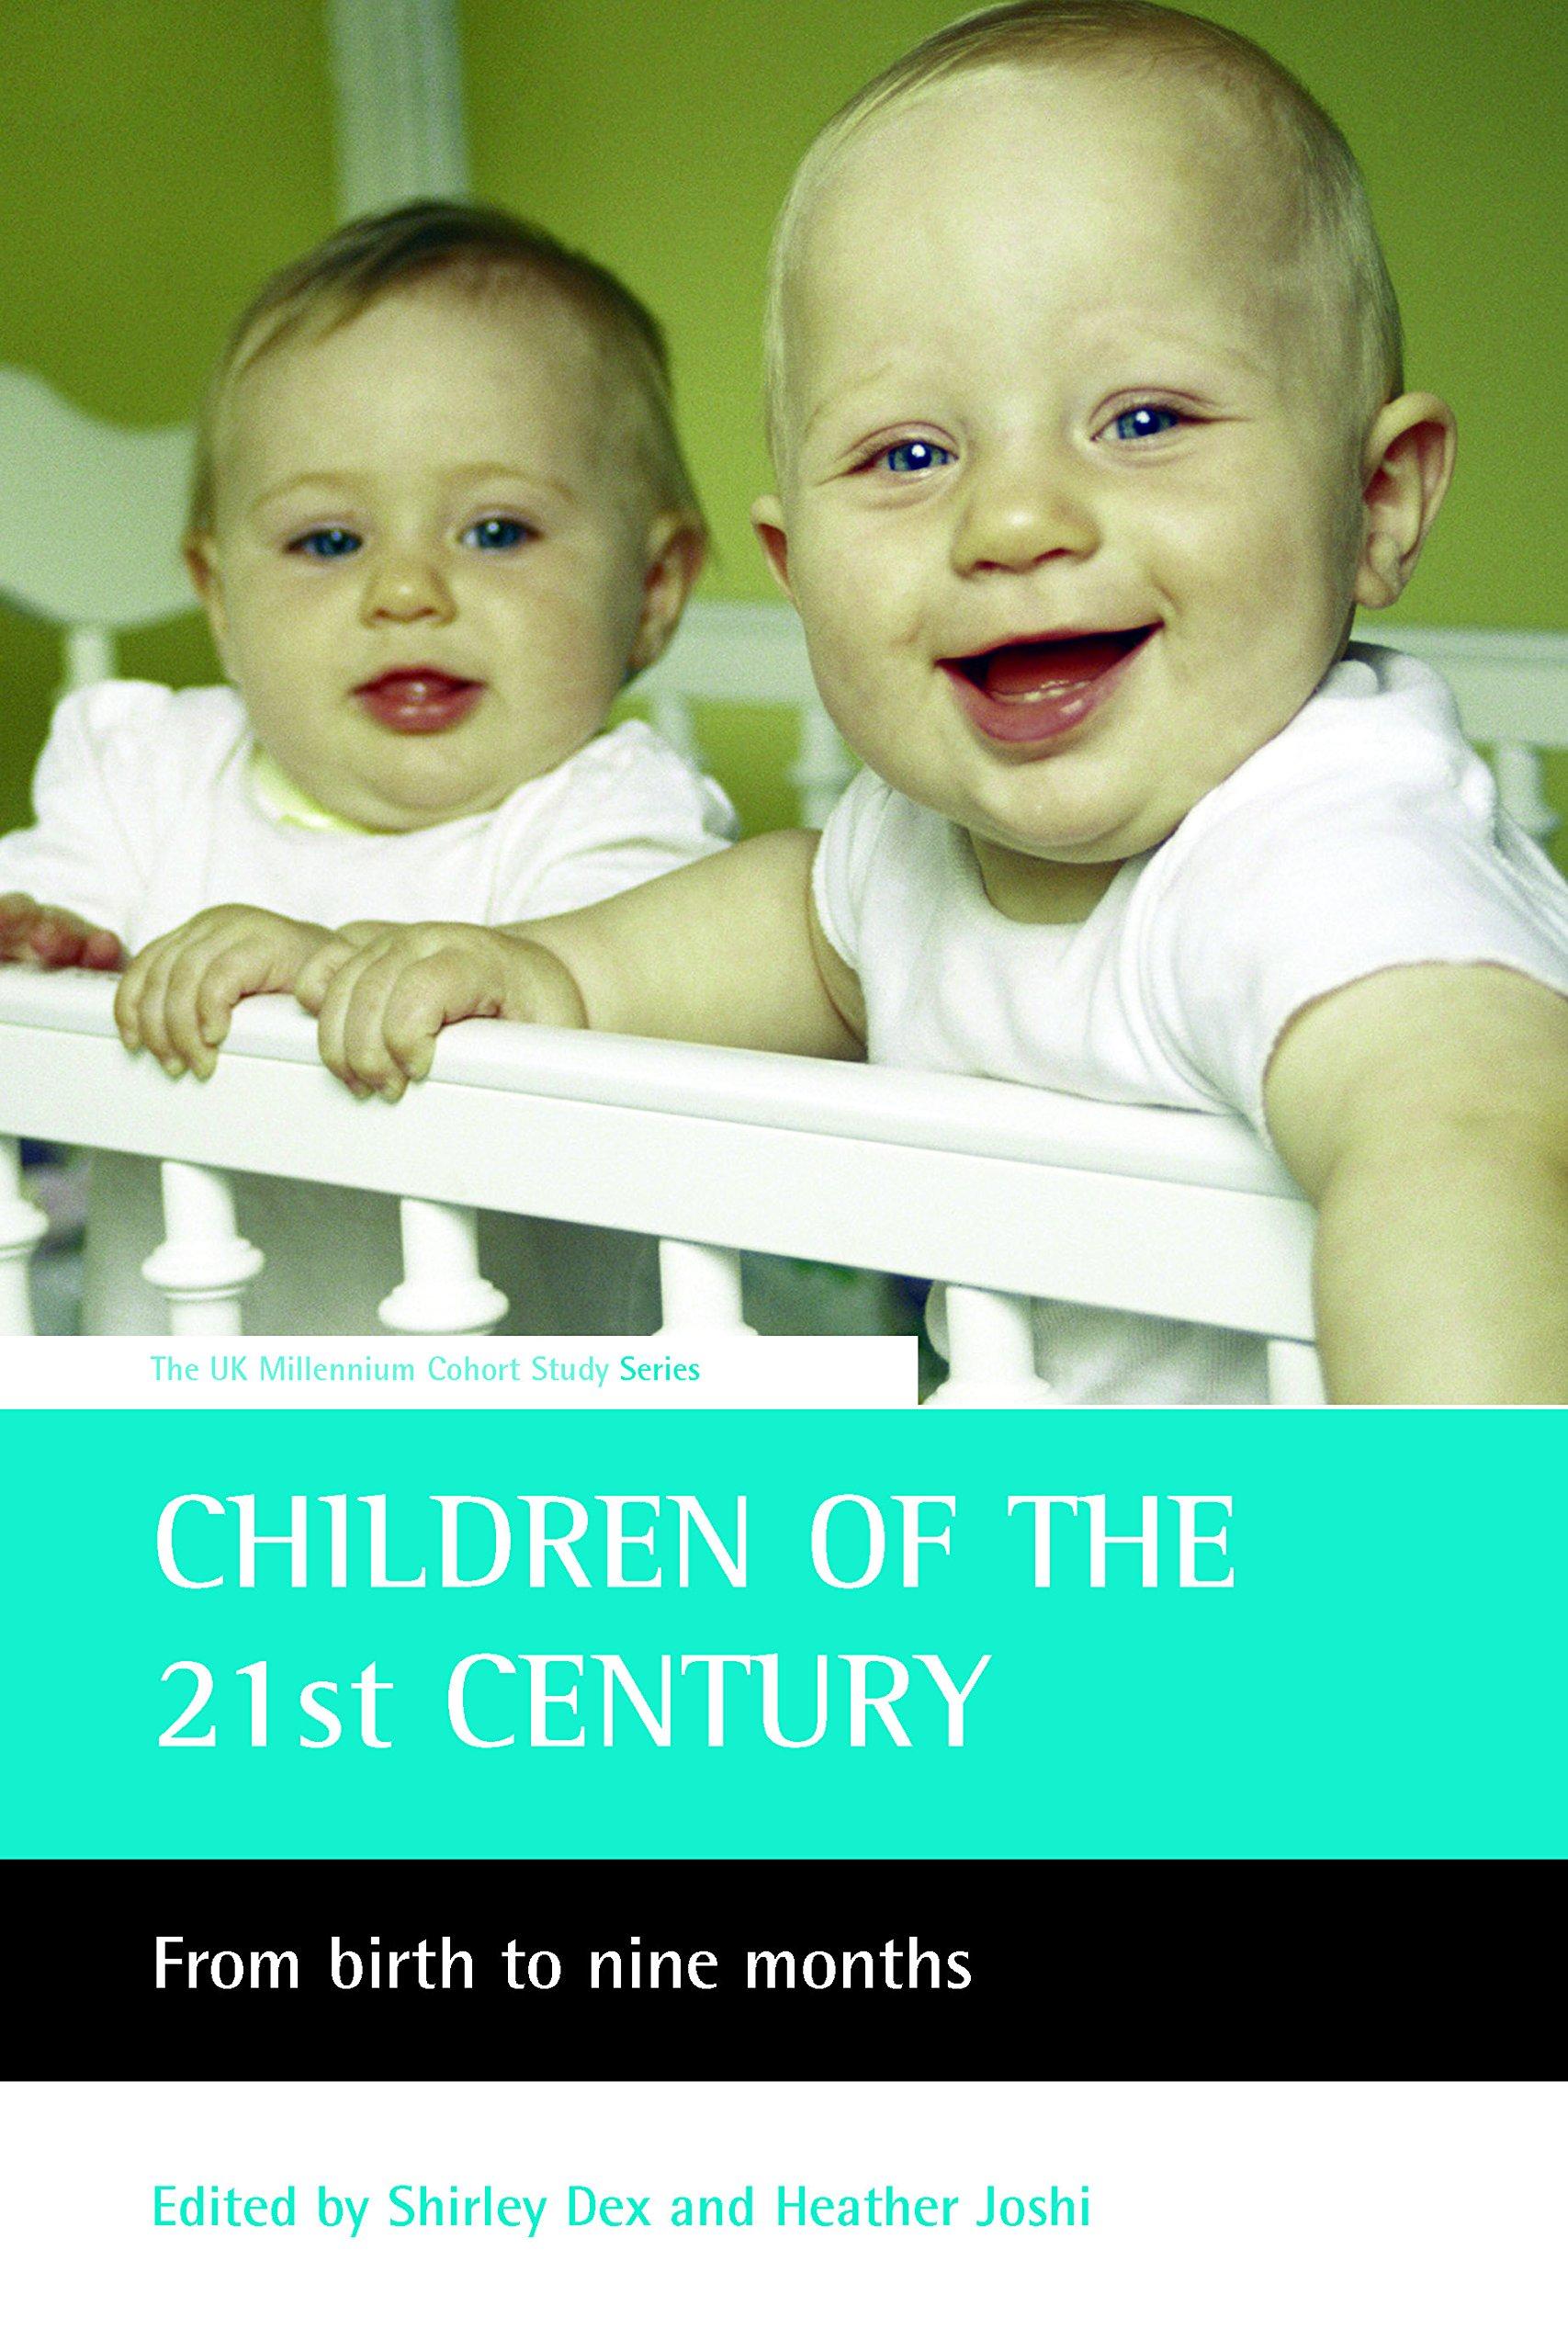 Children of the 21st century: From birth to nine months (UK Millenium Cohort Study) ebook